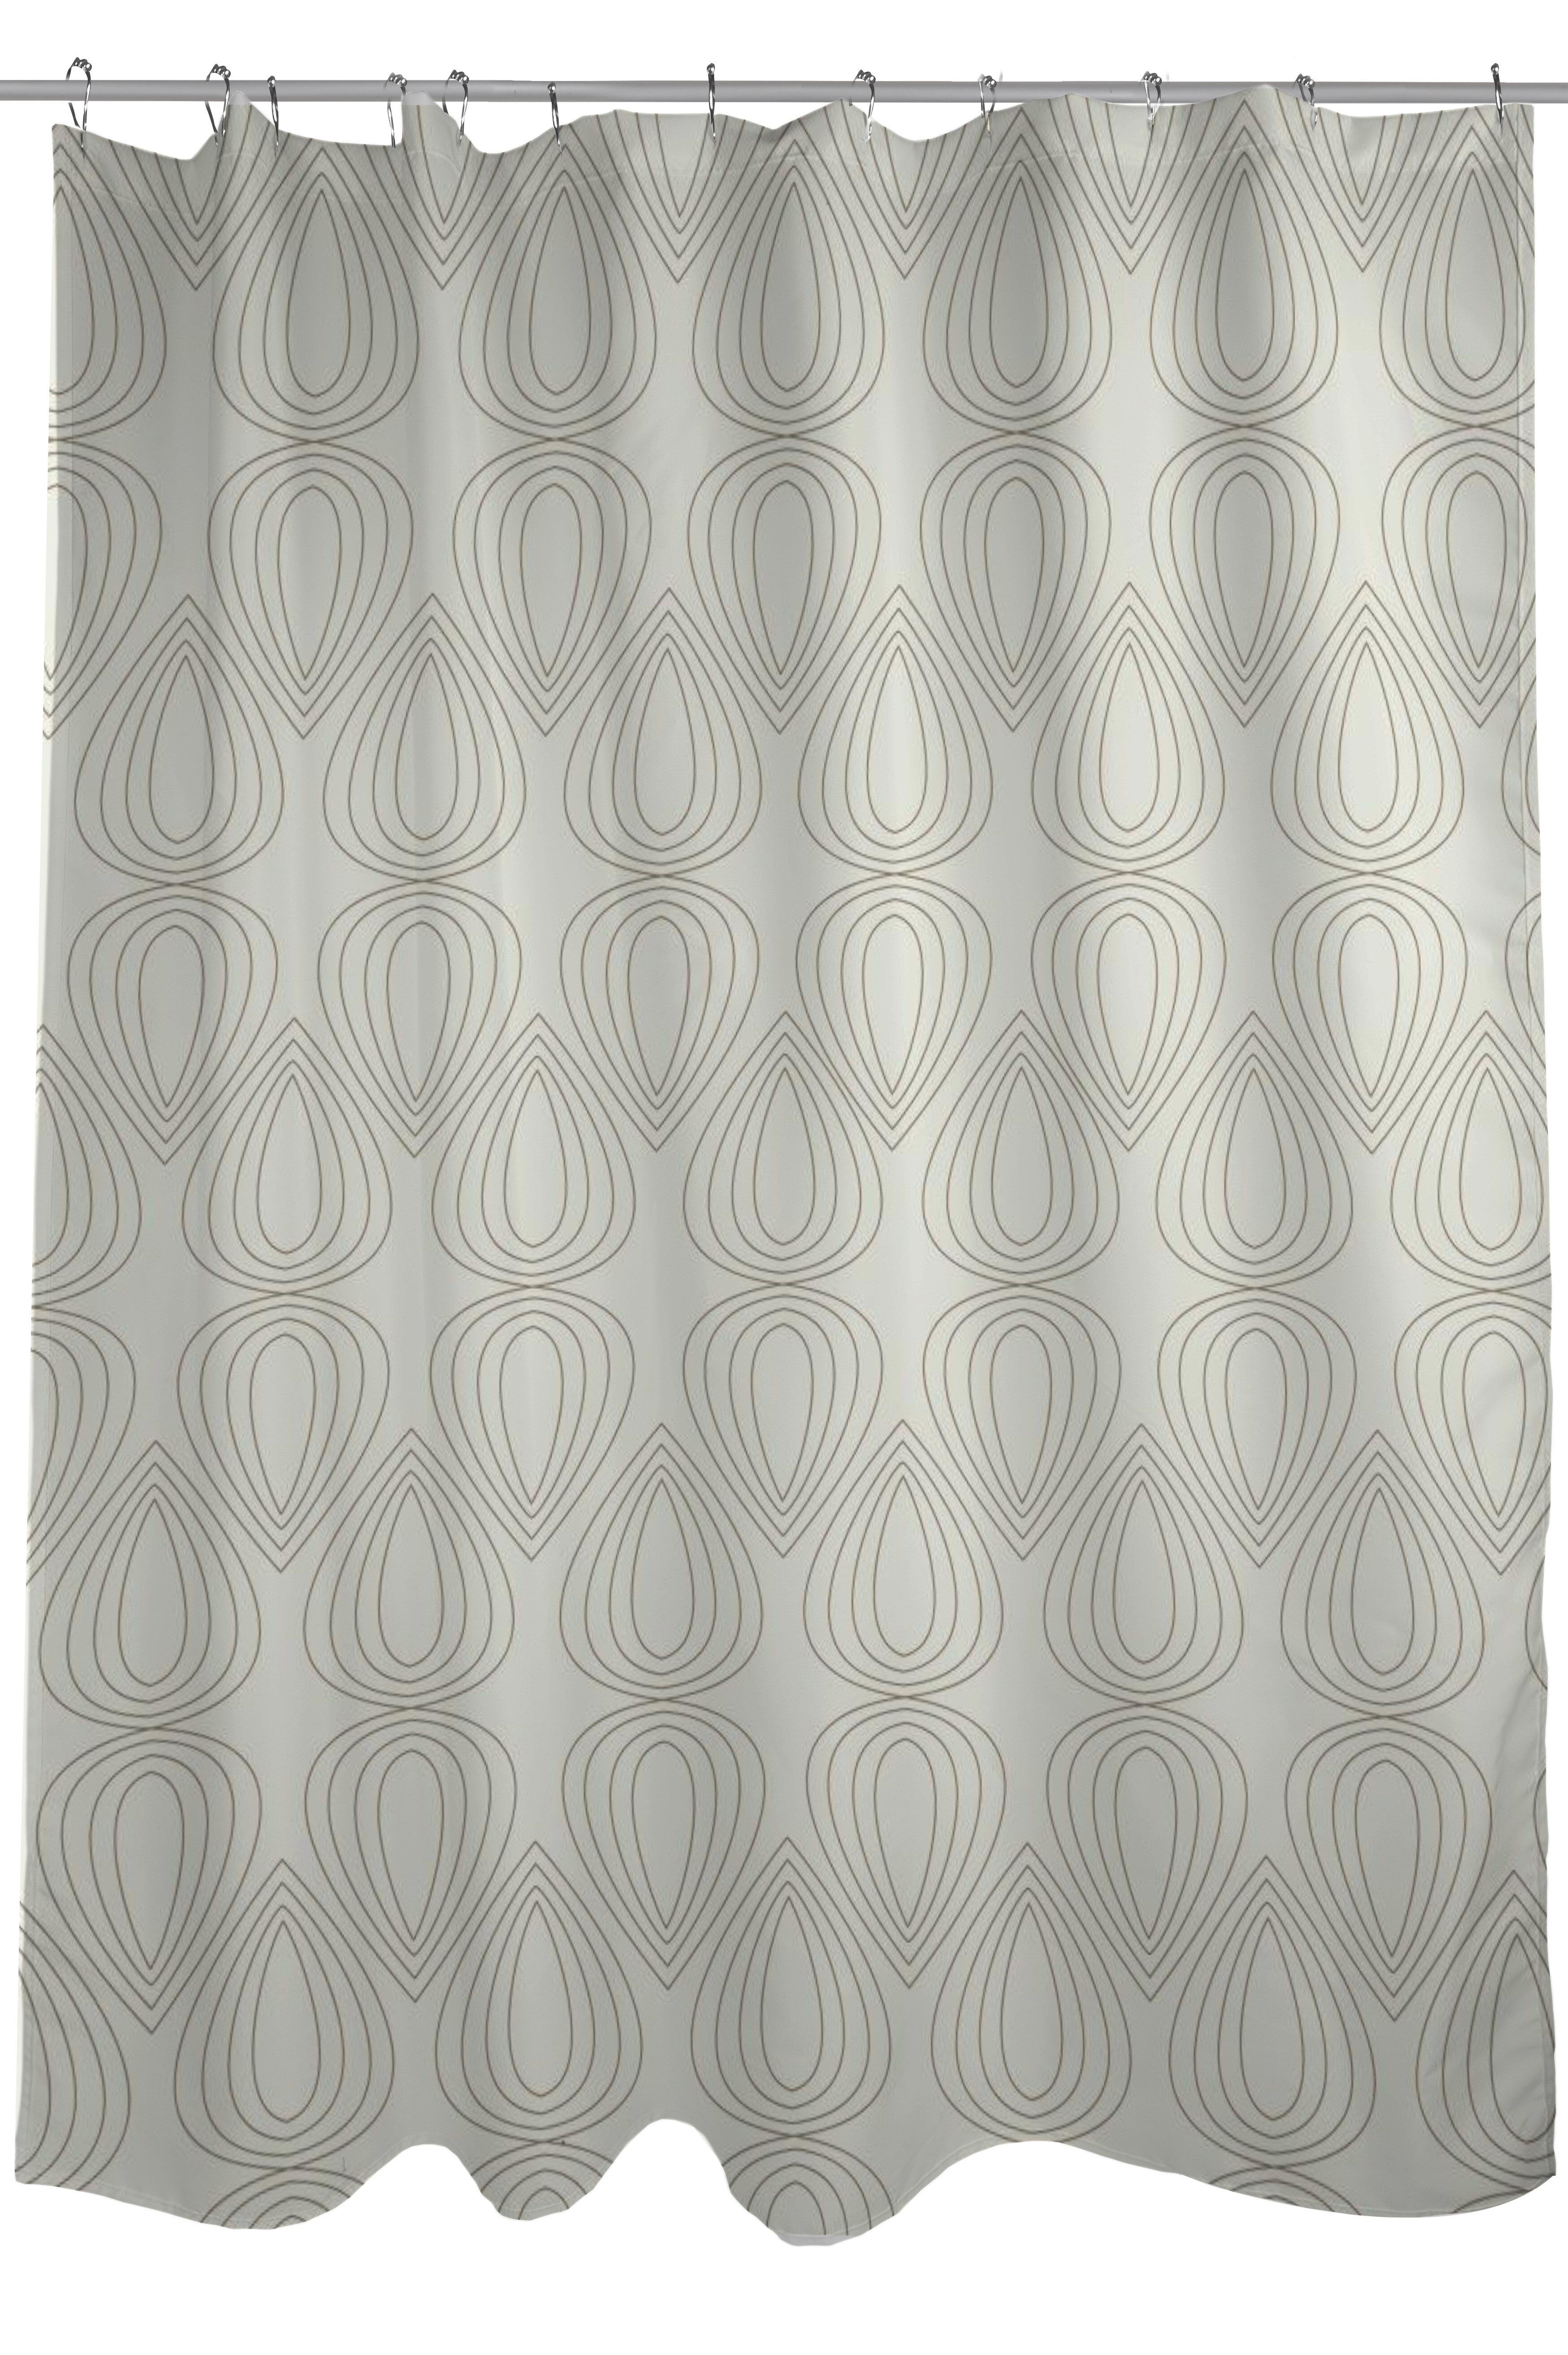 One Bella Casa Mod Drops Geometric Shower Curtain